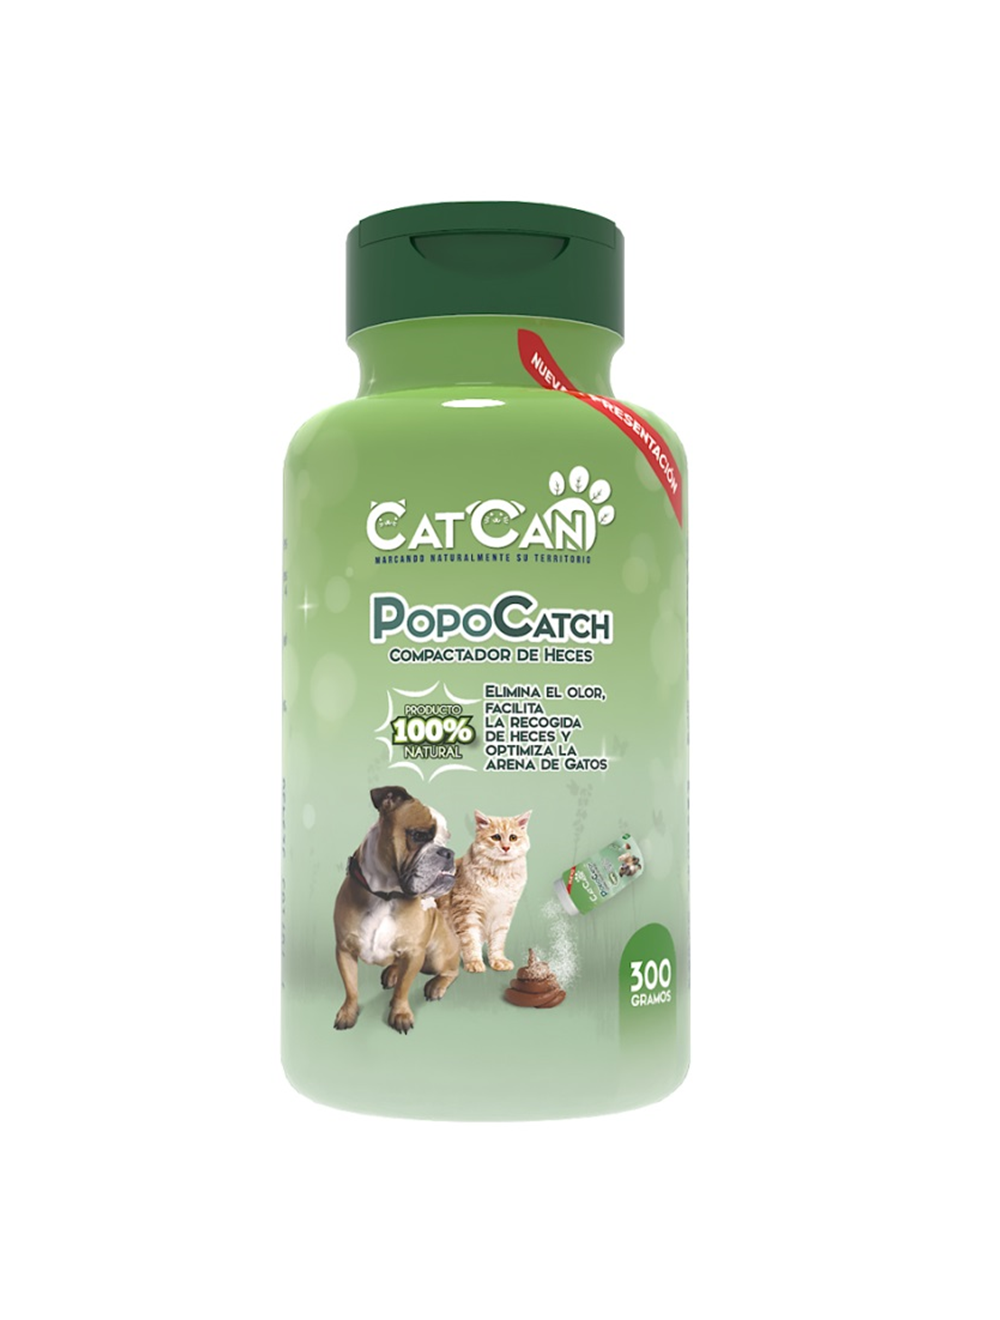 Cat Can Popo Catch x 300g